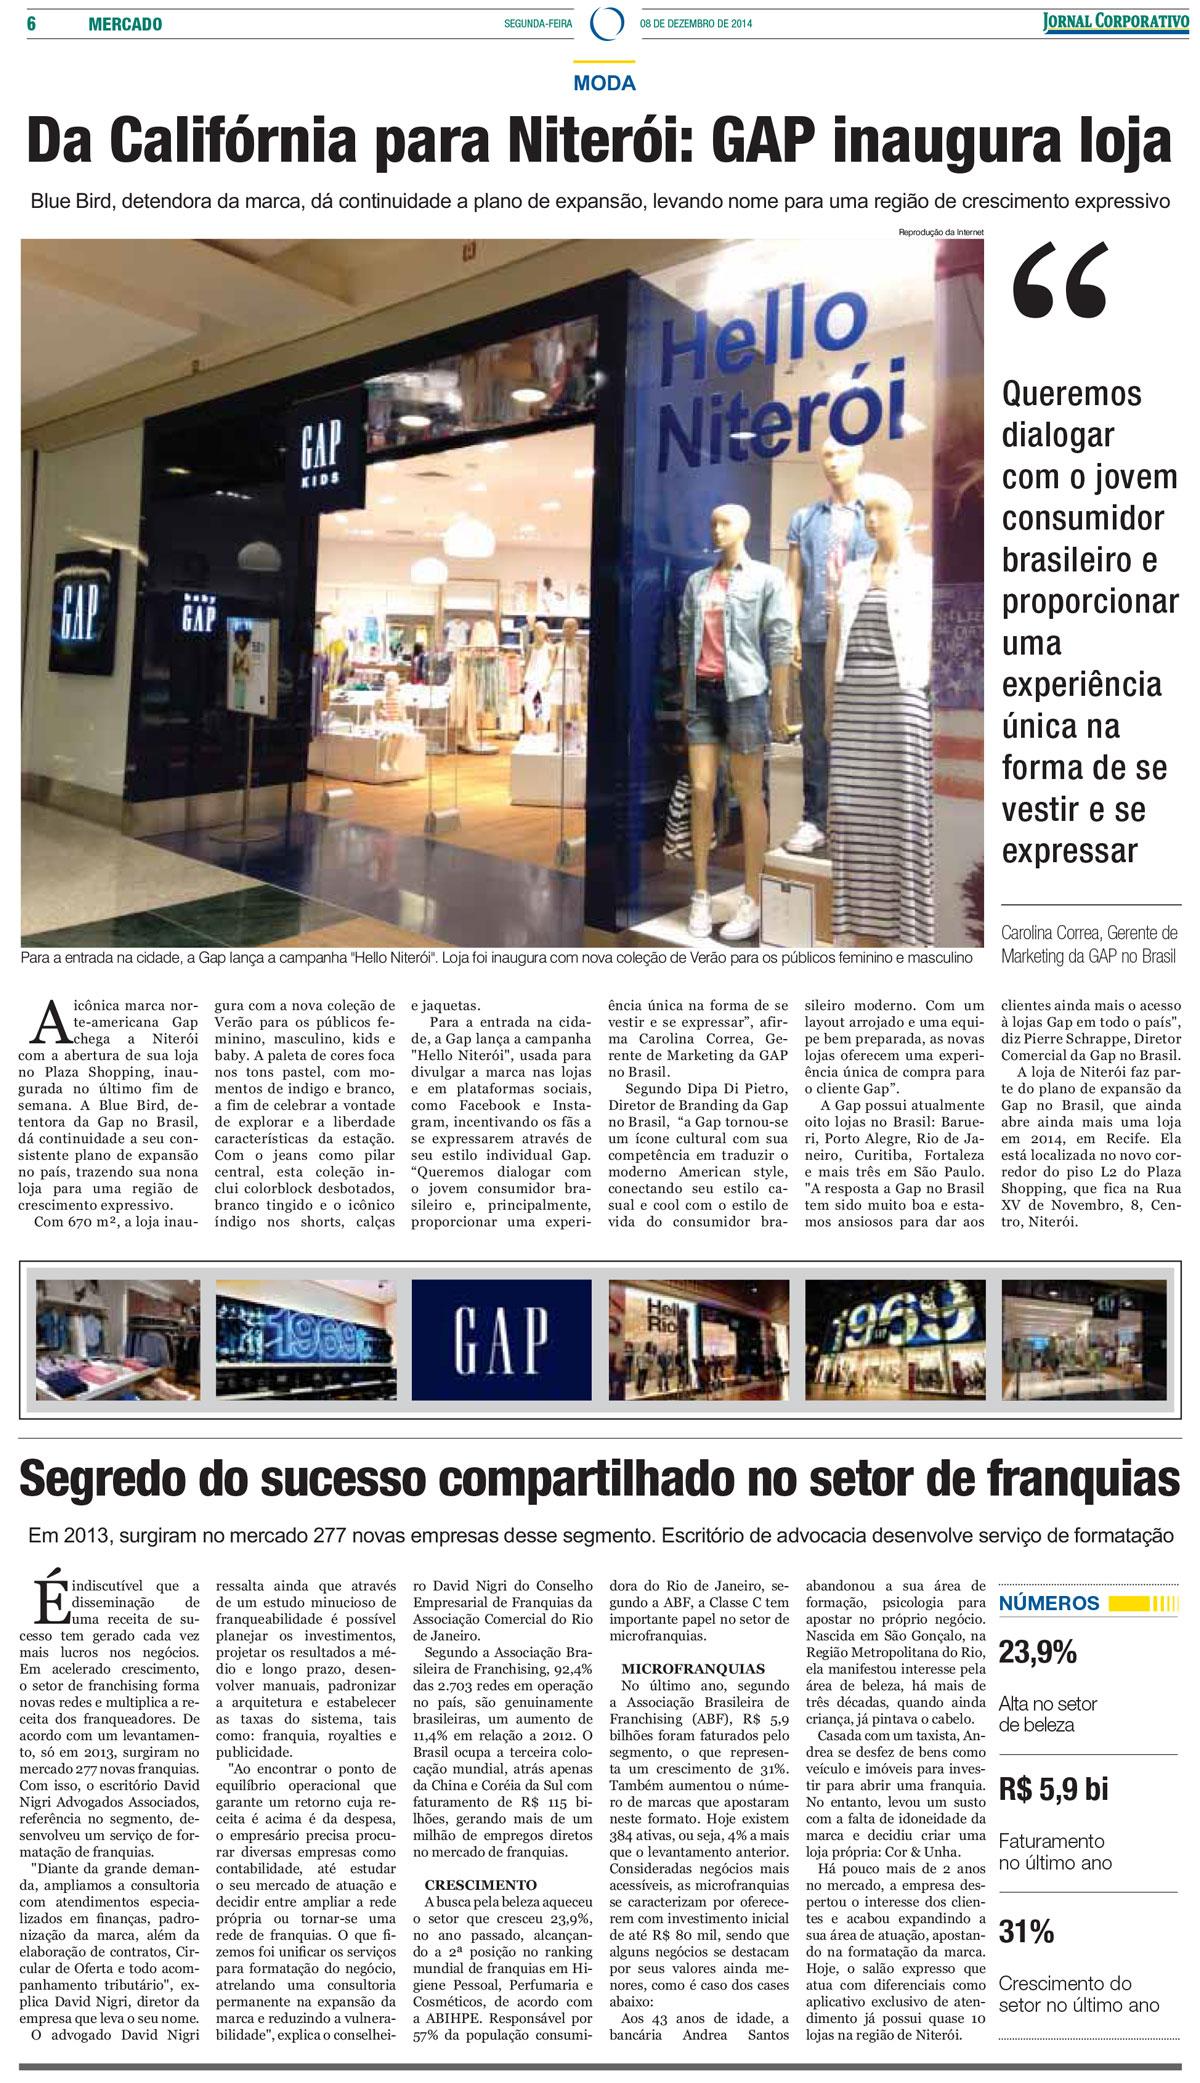 formatacaofranquias_jornalcorporativo